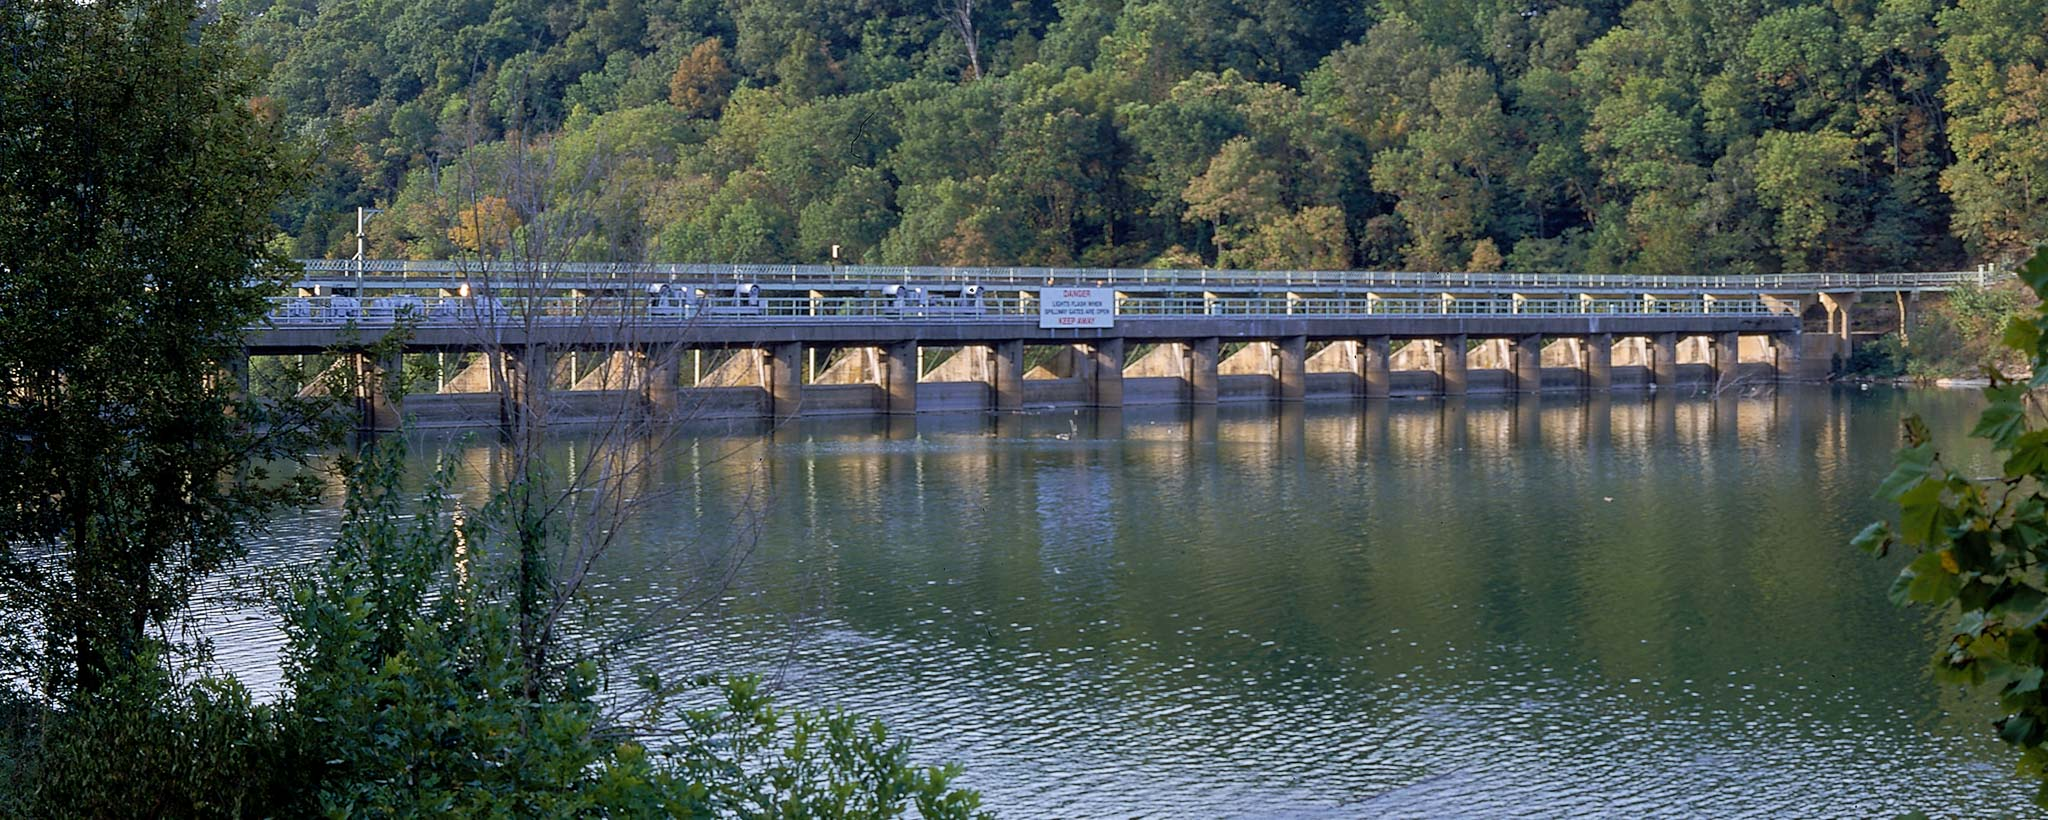 Great Falls Dam